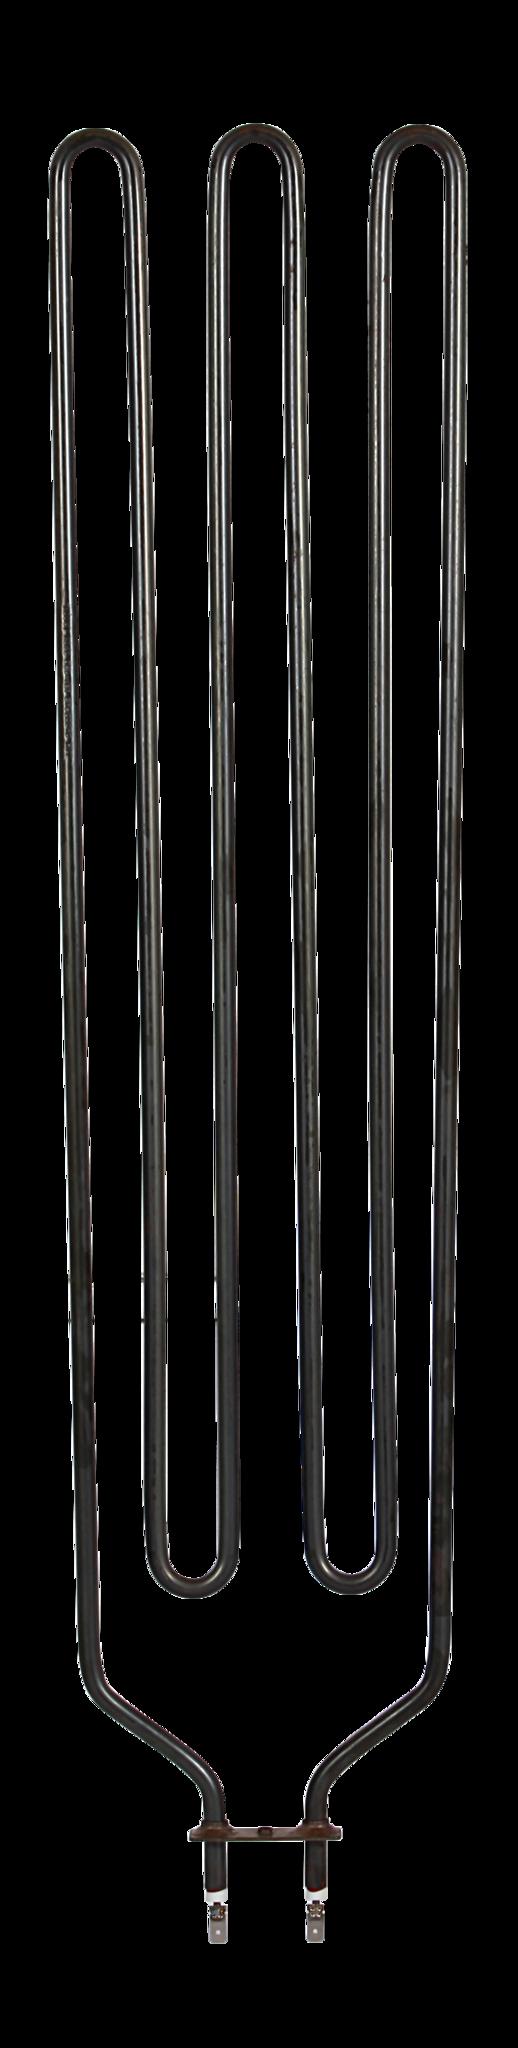 ТЭН-ы: ТЭН SAWO HP70-005 для электрических печей Aries (2 кВт) запчасти